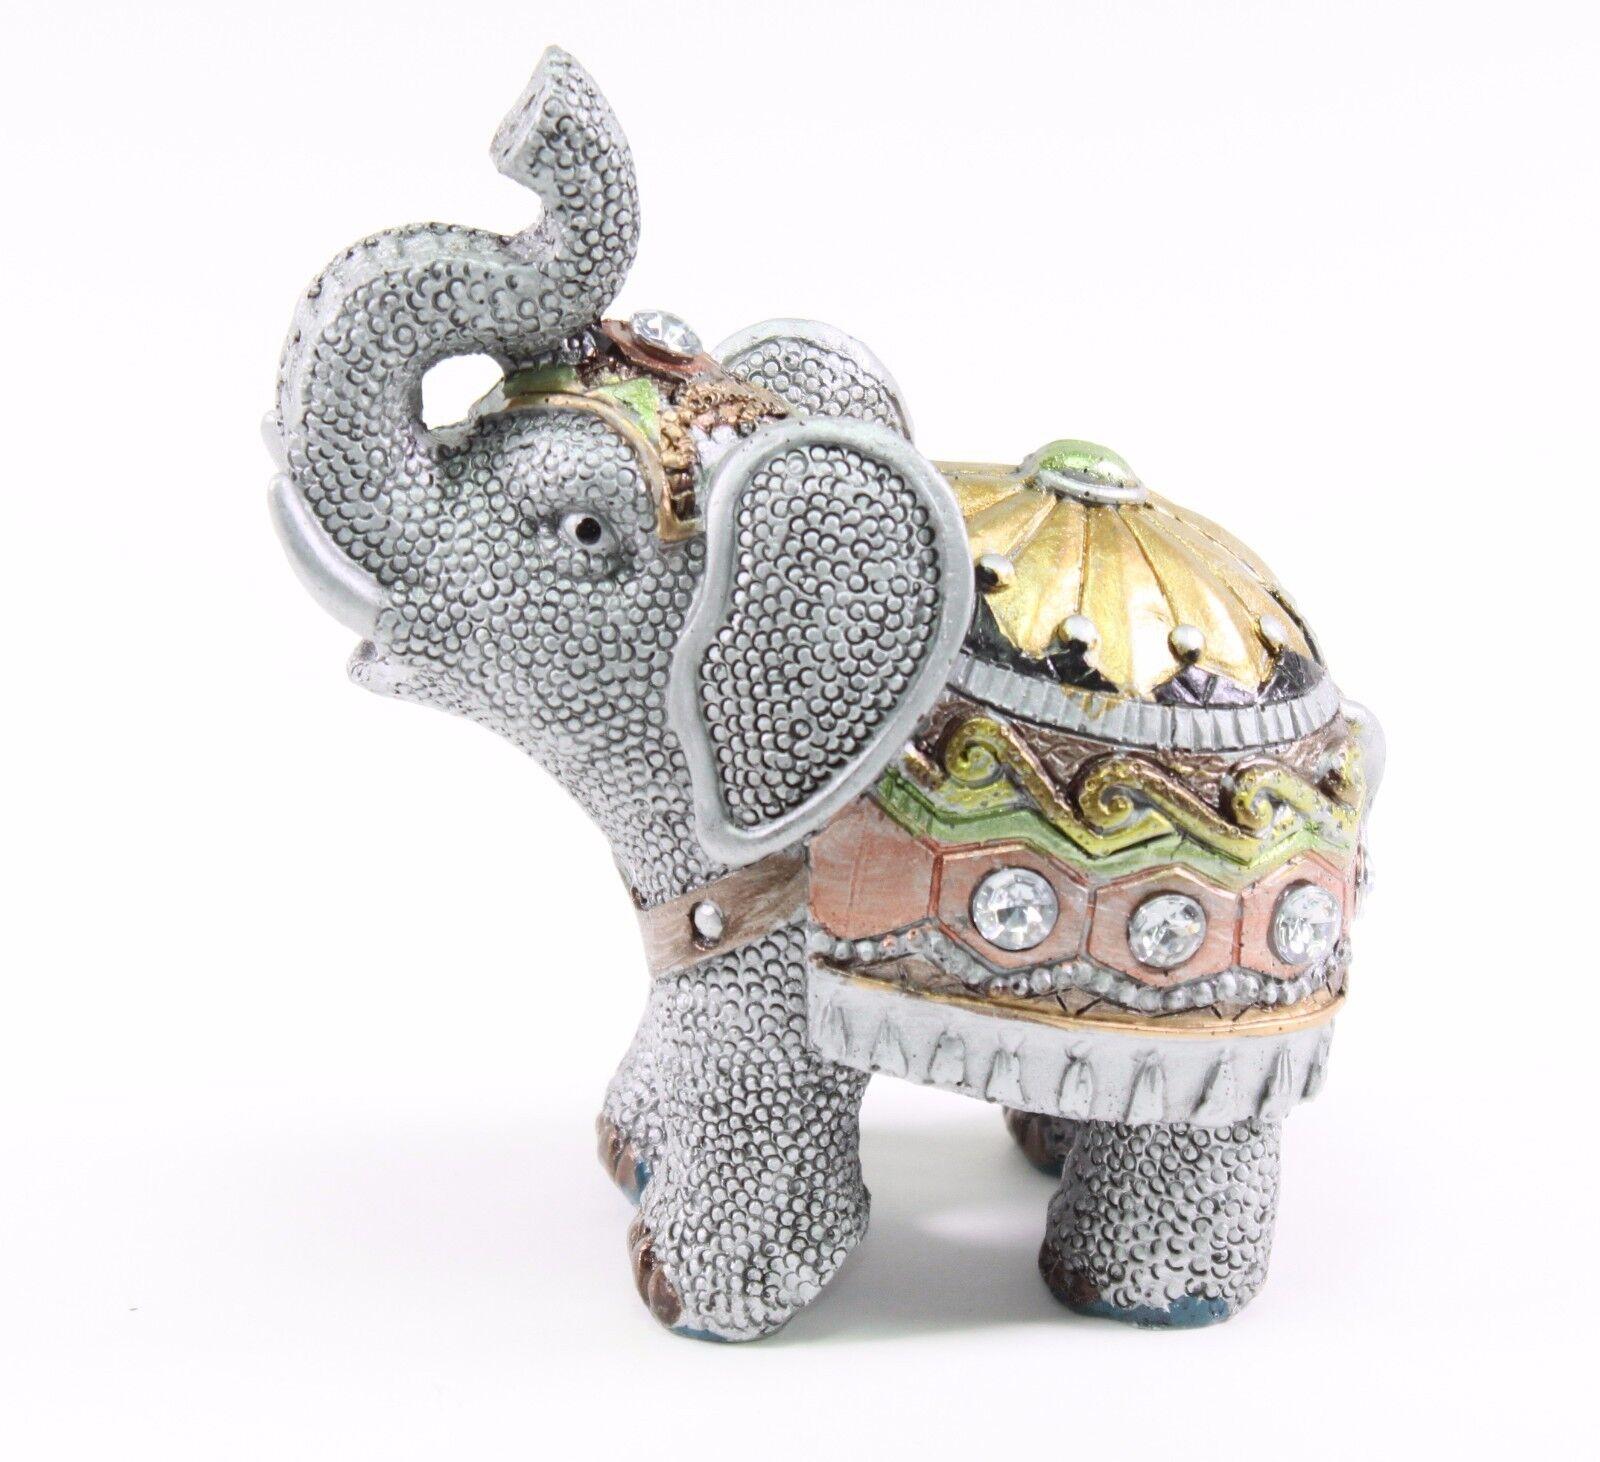 "Feng Shui 4.5"" Gray Elephant Trunk Statue Lucky Figurine"